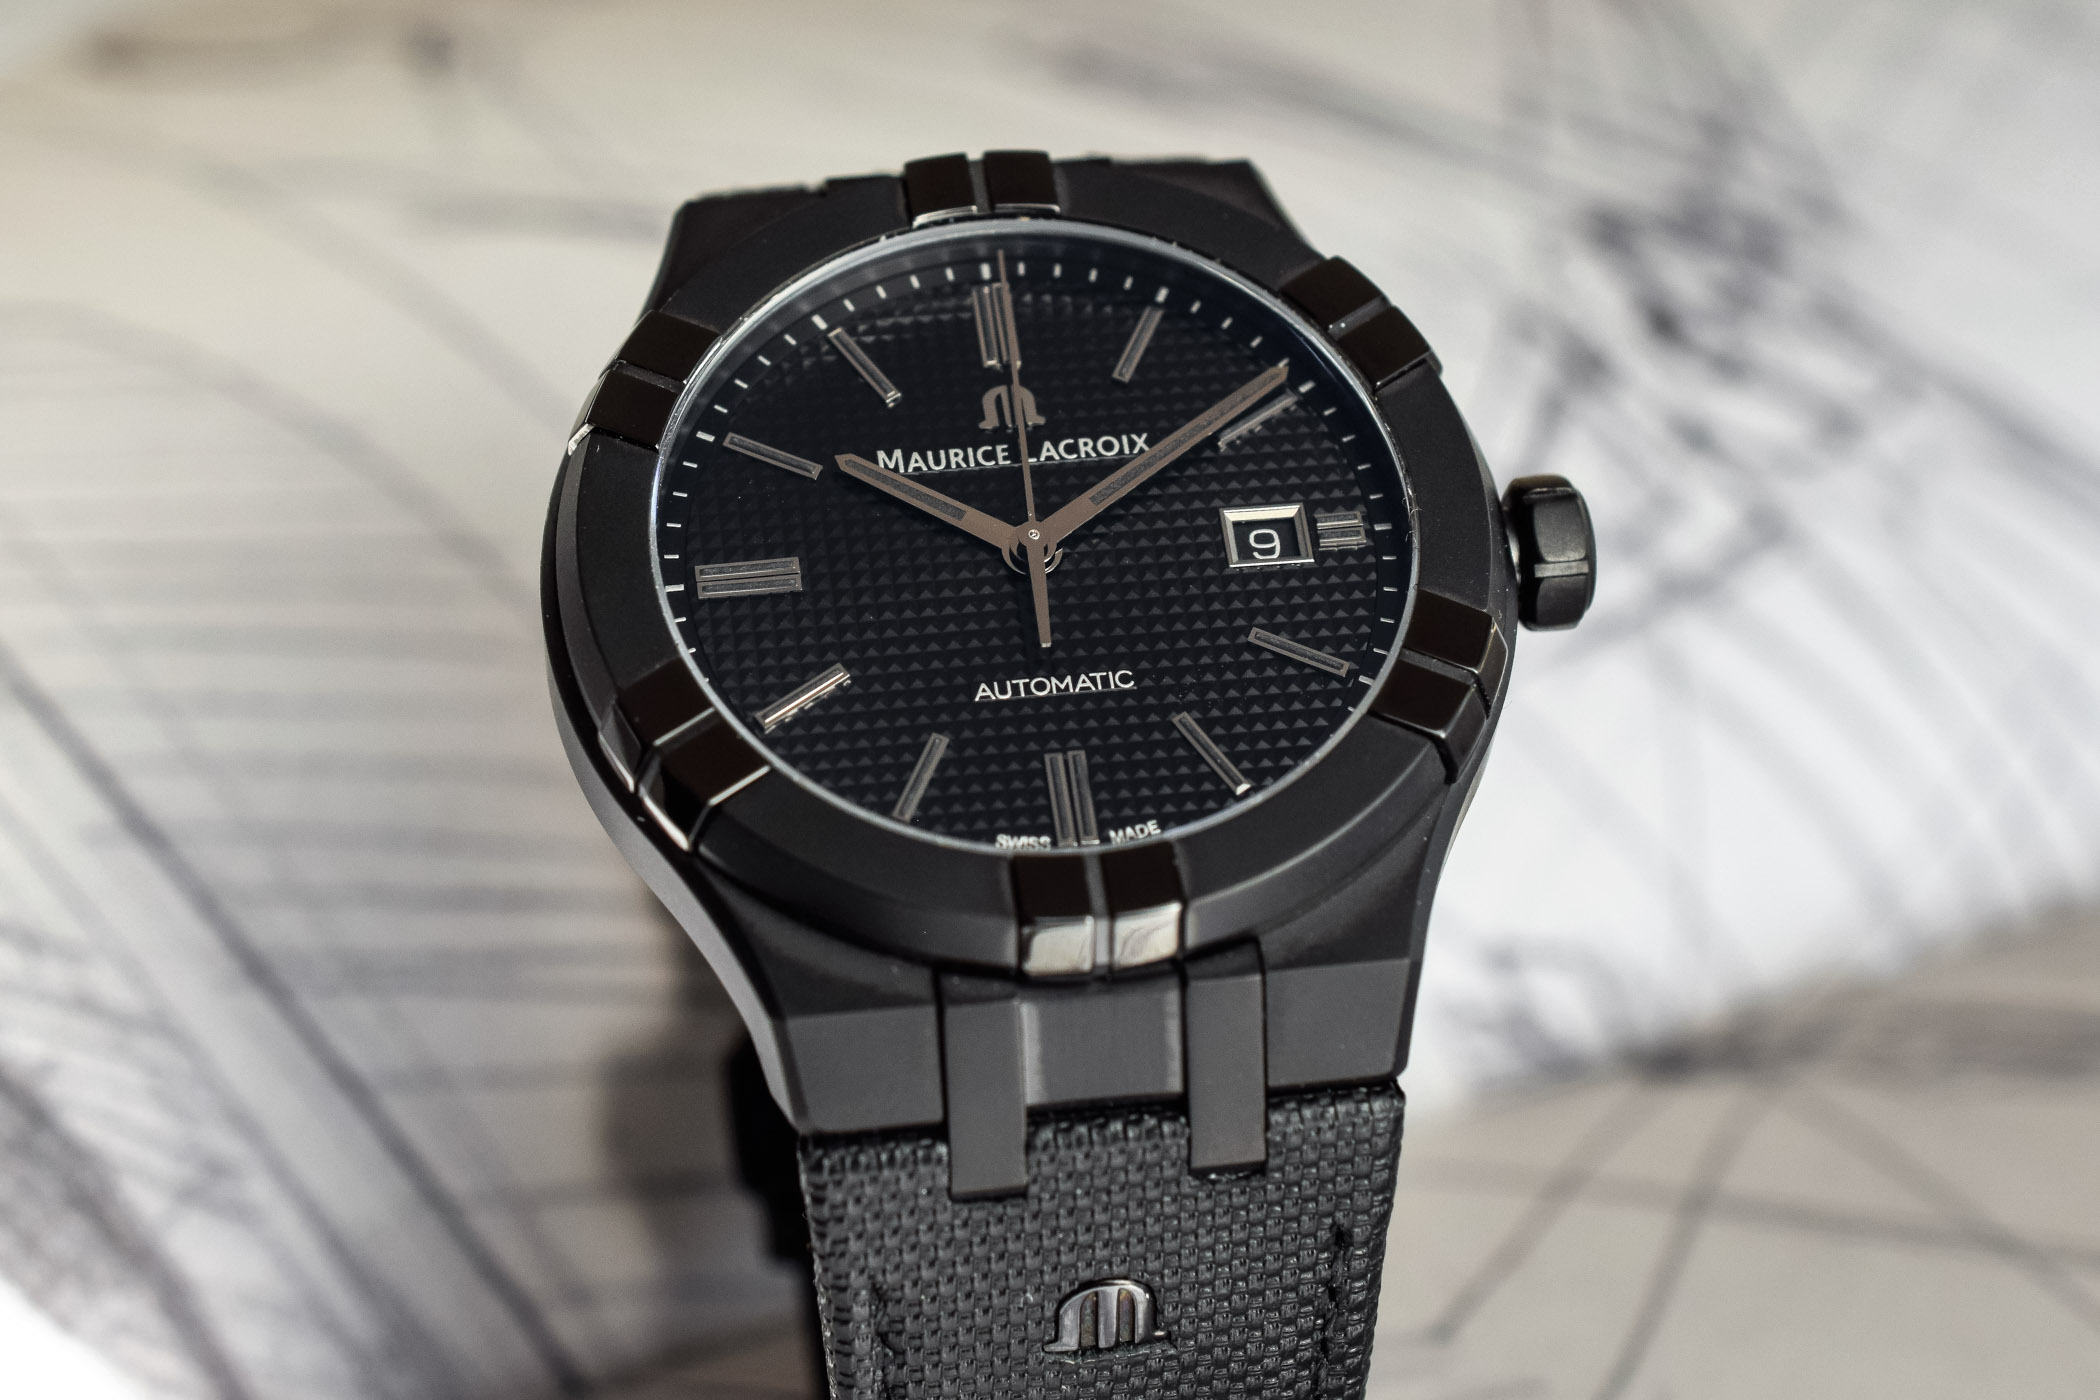 Maurice Lacroix Aikon Automatic All-Black - Geneva Watch Week 2019 - 4